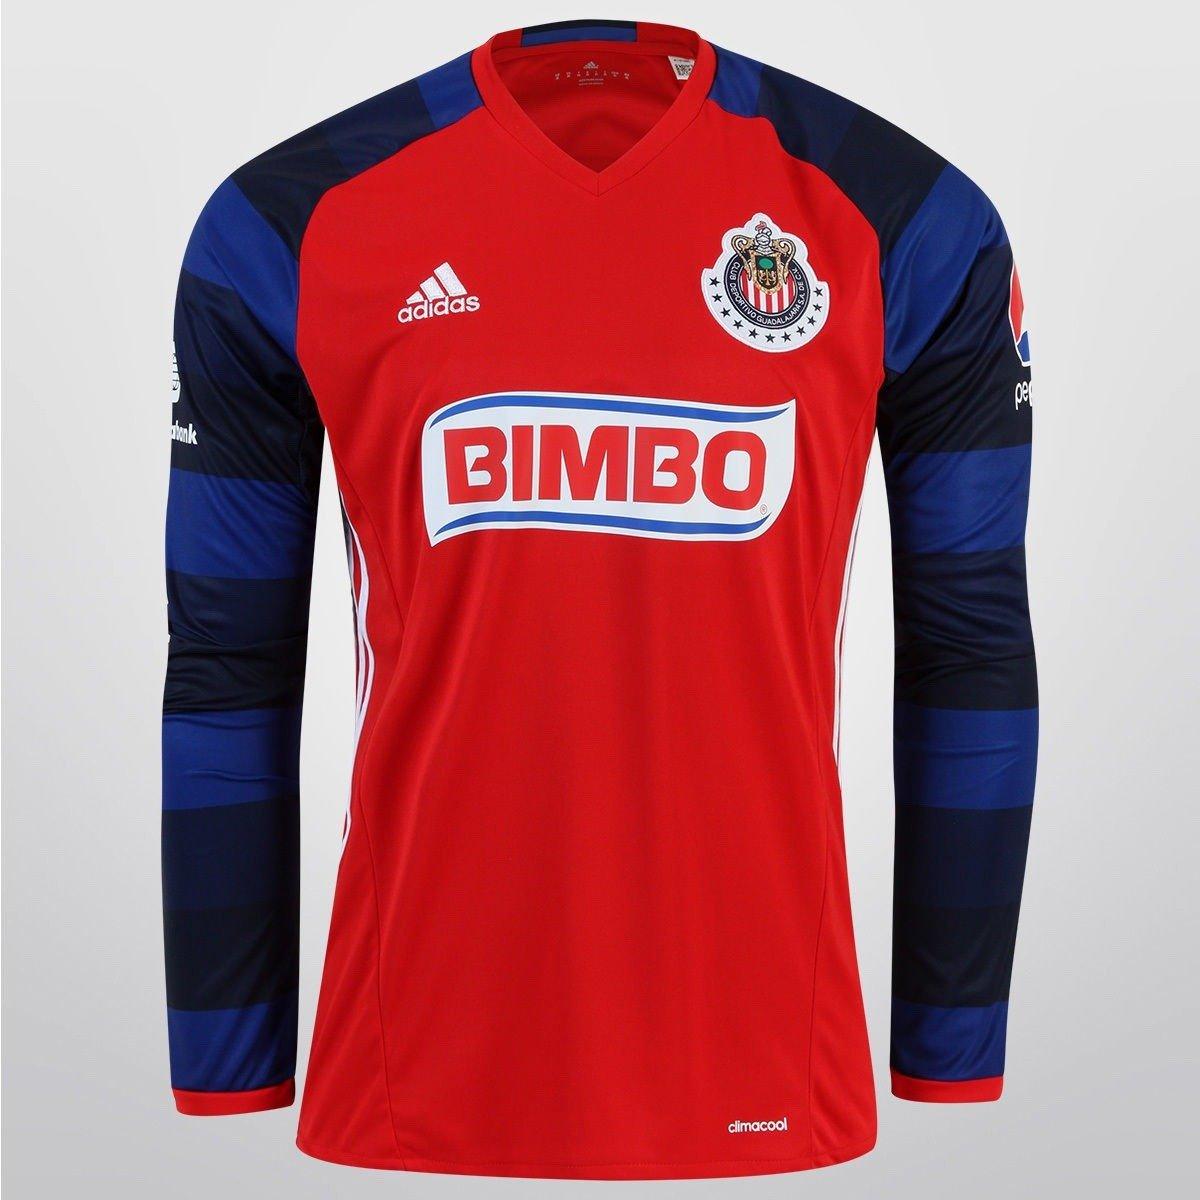 adidas Jersey para Hombre Color Rojo Chivas Talla L AC2740 770687bcd1c3f